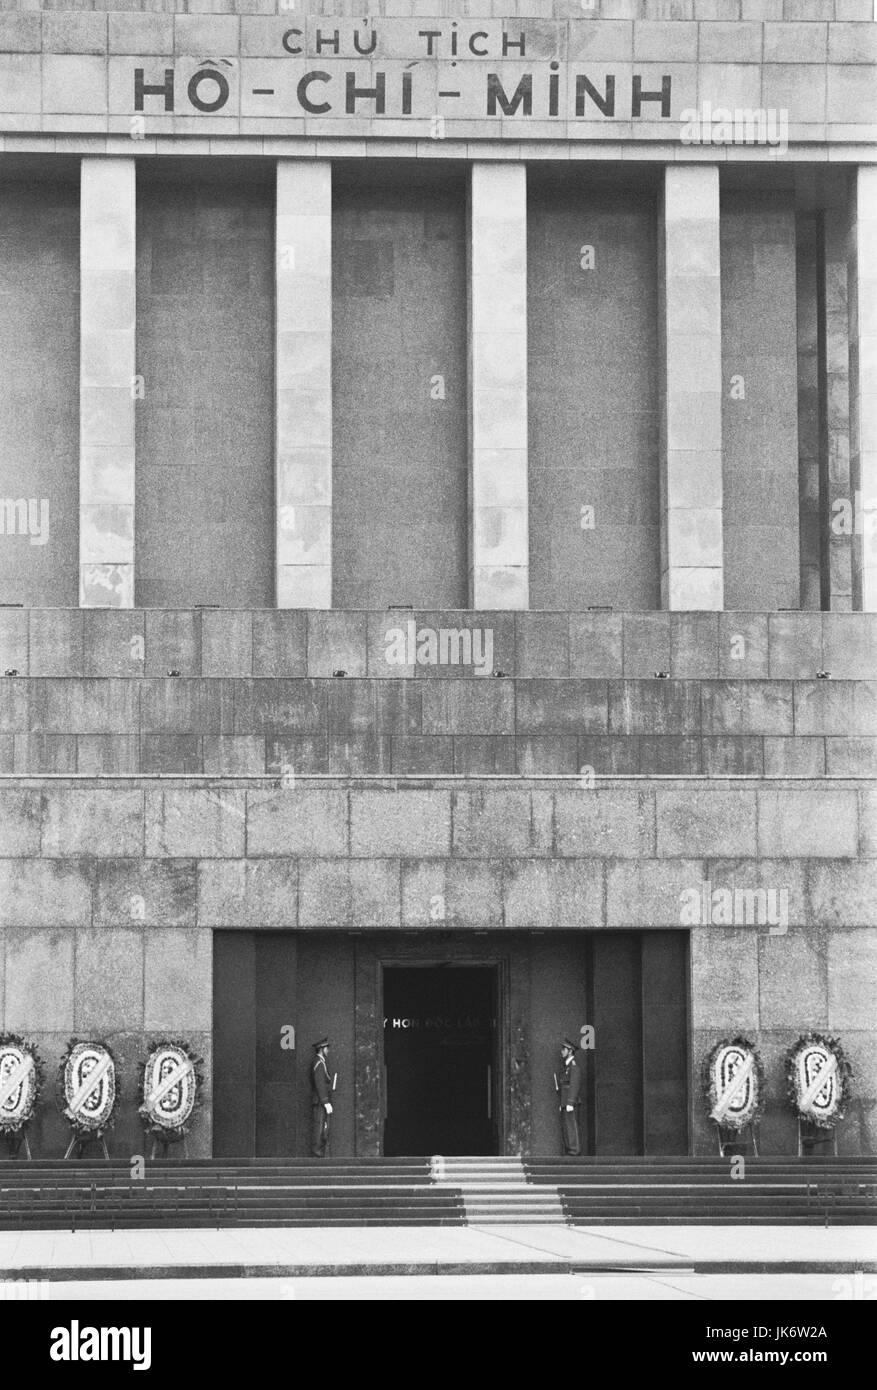 Vietnam, Hanoi, Ho Chi Minh Mausoleum,  s/w  außen, Südostasien, Hinterindien, Tongkingdelta, Hauptstadt, - Stock Image